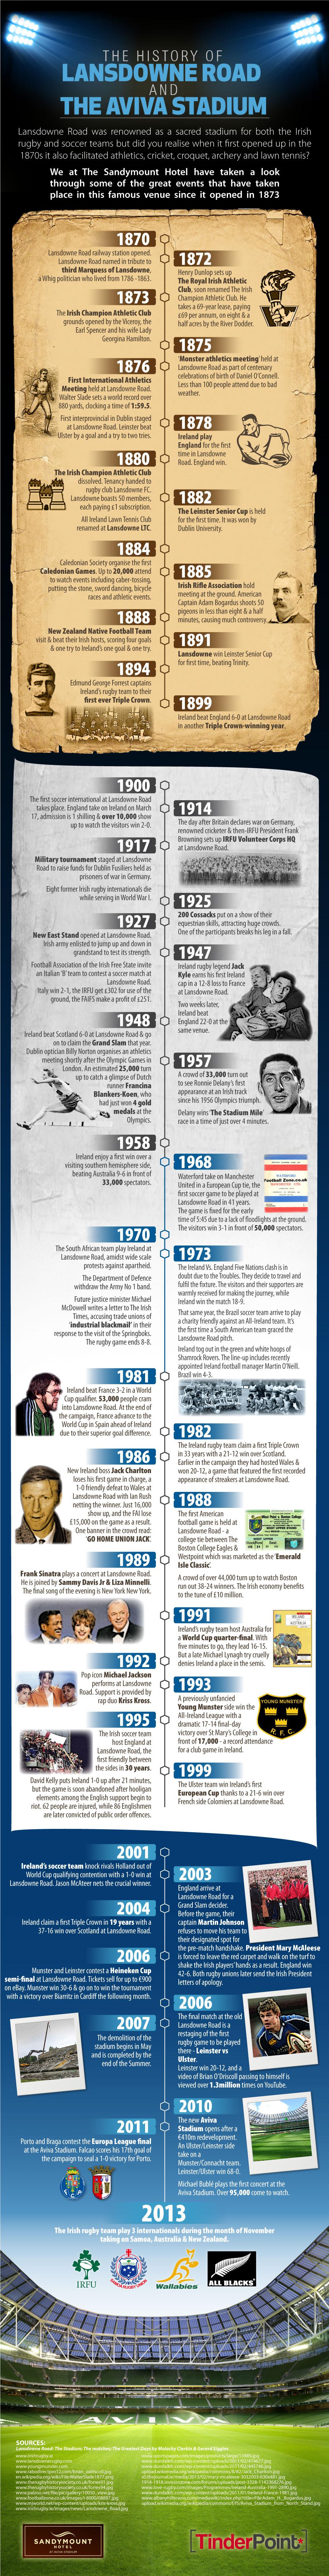 The History of Lansdowne Road and The Aviva Stadium